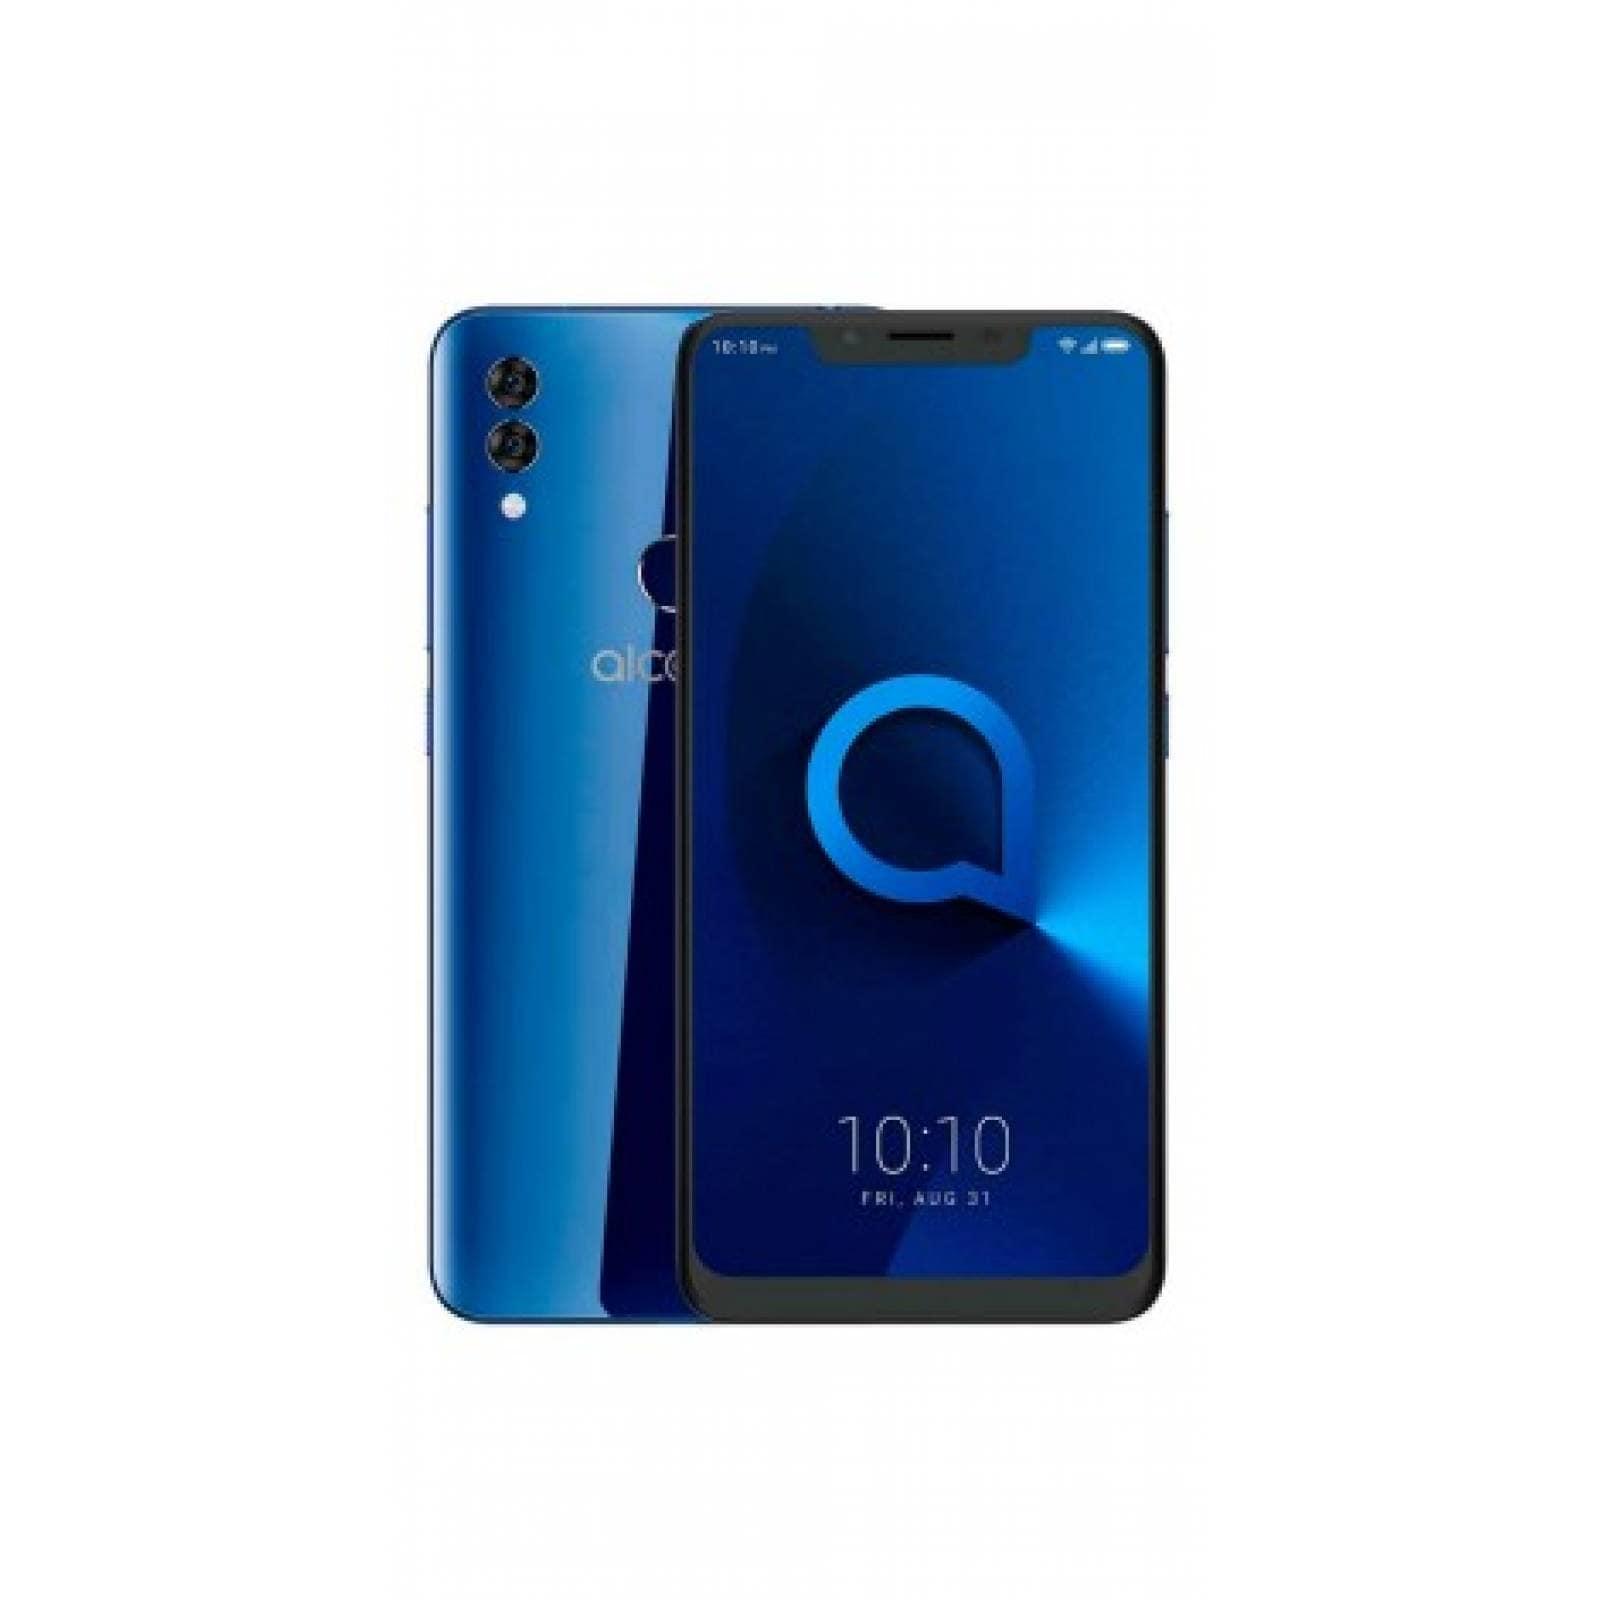 Celular ALCATEL LTE 5060A 5V Color AZUL Telcel